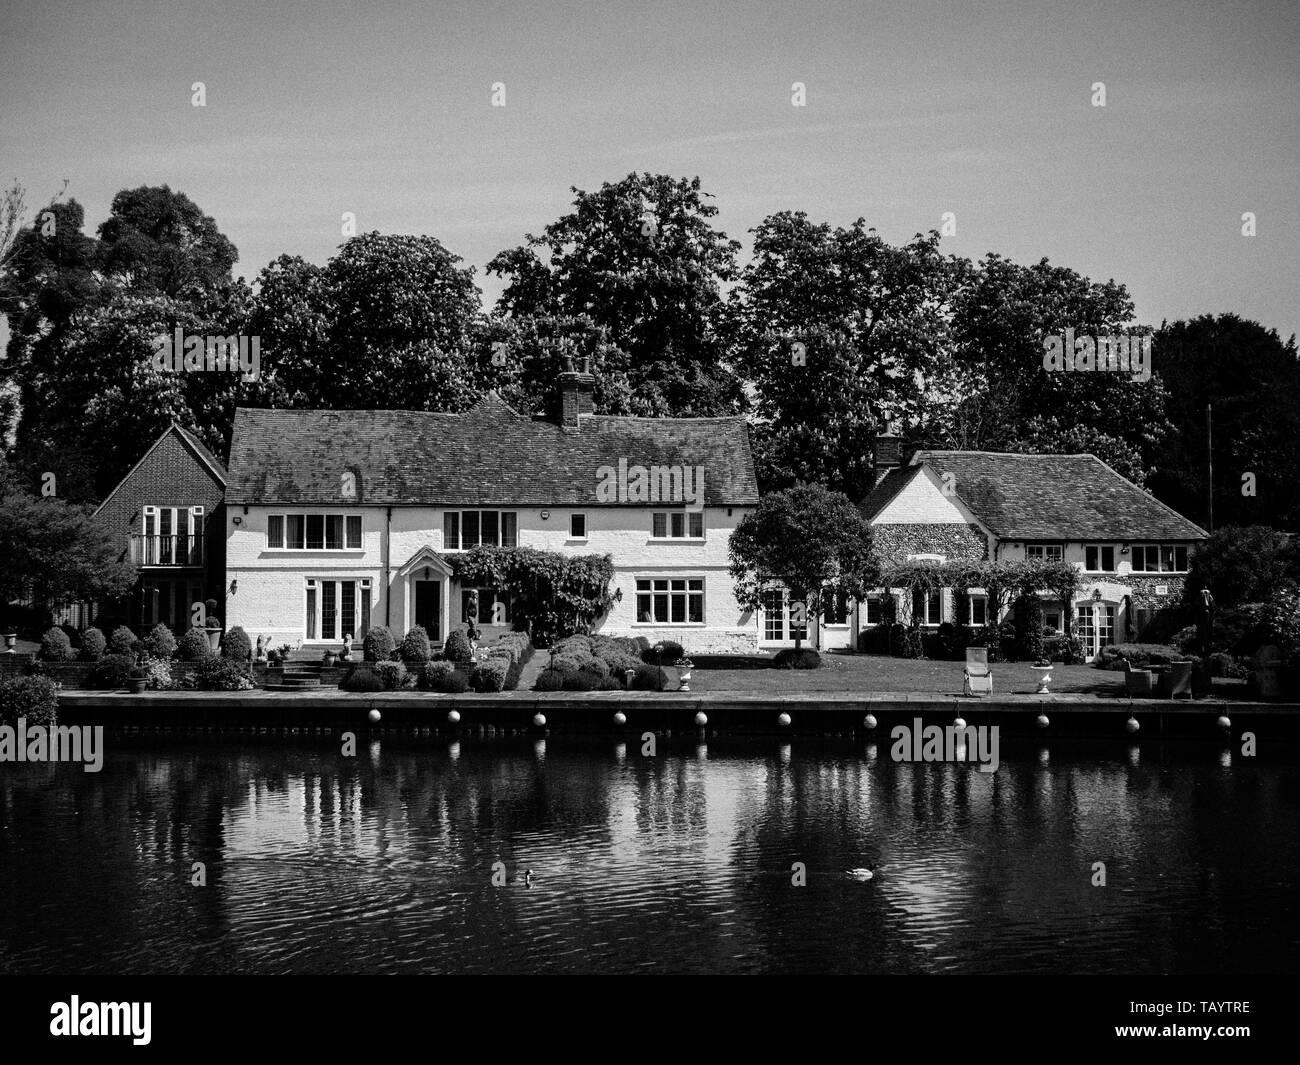 Lovely Landscape, Riverside Houses, Mill End, River Thames, Buckinghamshire, England, UK, GB. - Stock Image